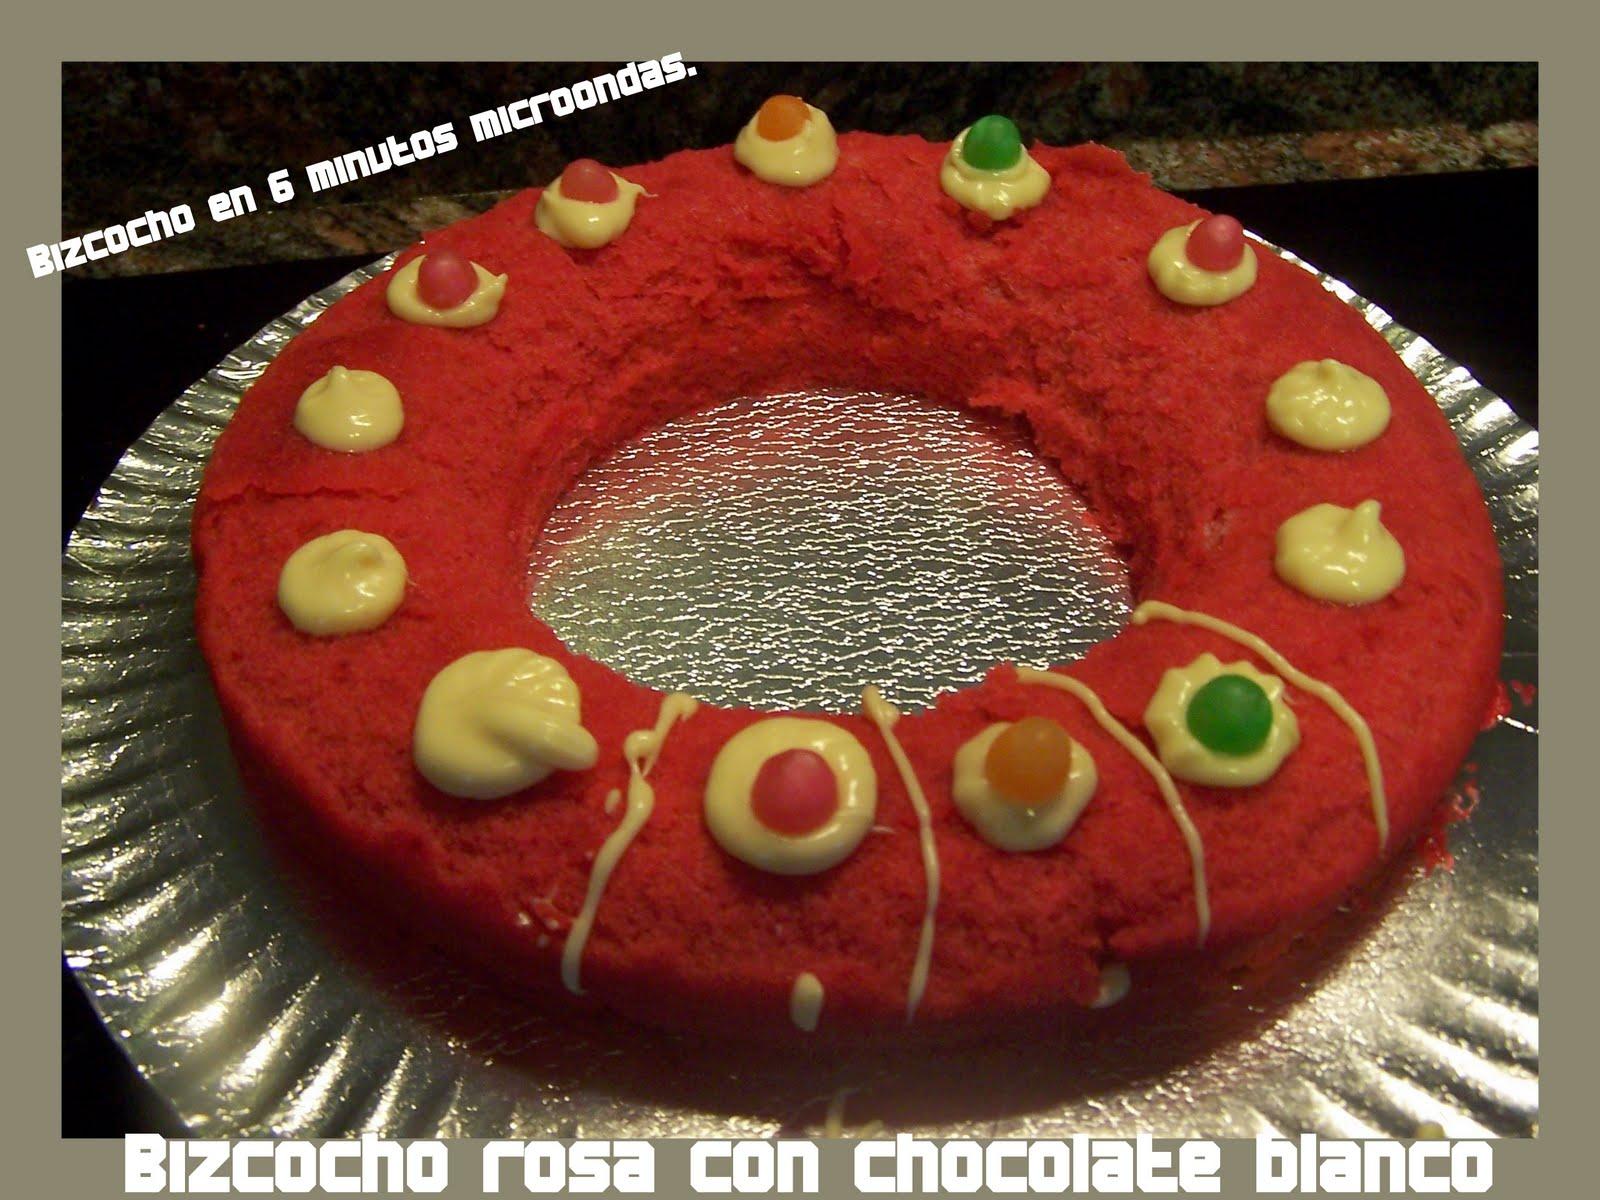 Dulce sabor de carmen artesana art cakes bizcocho sin - Bizcocho microondas 3 minutos ...